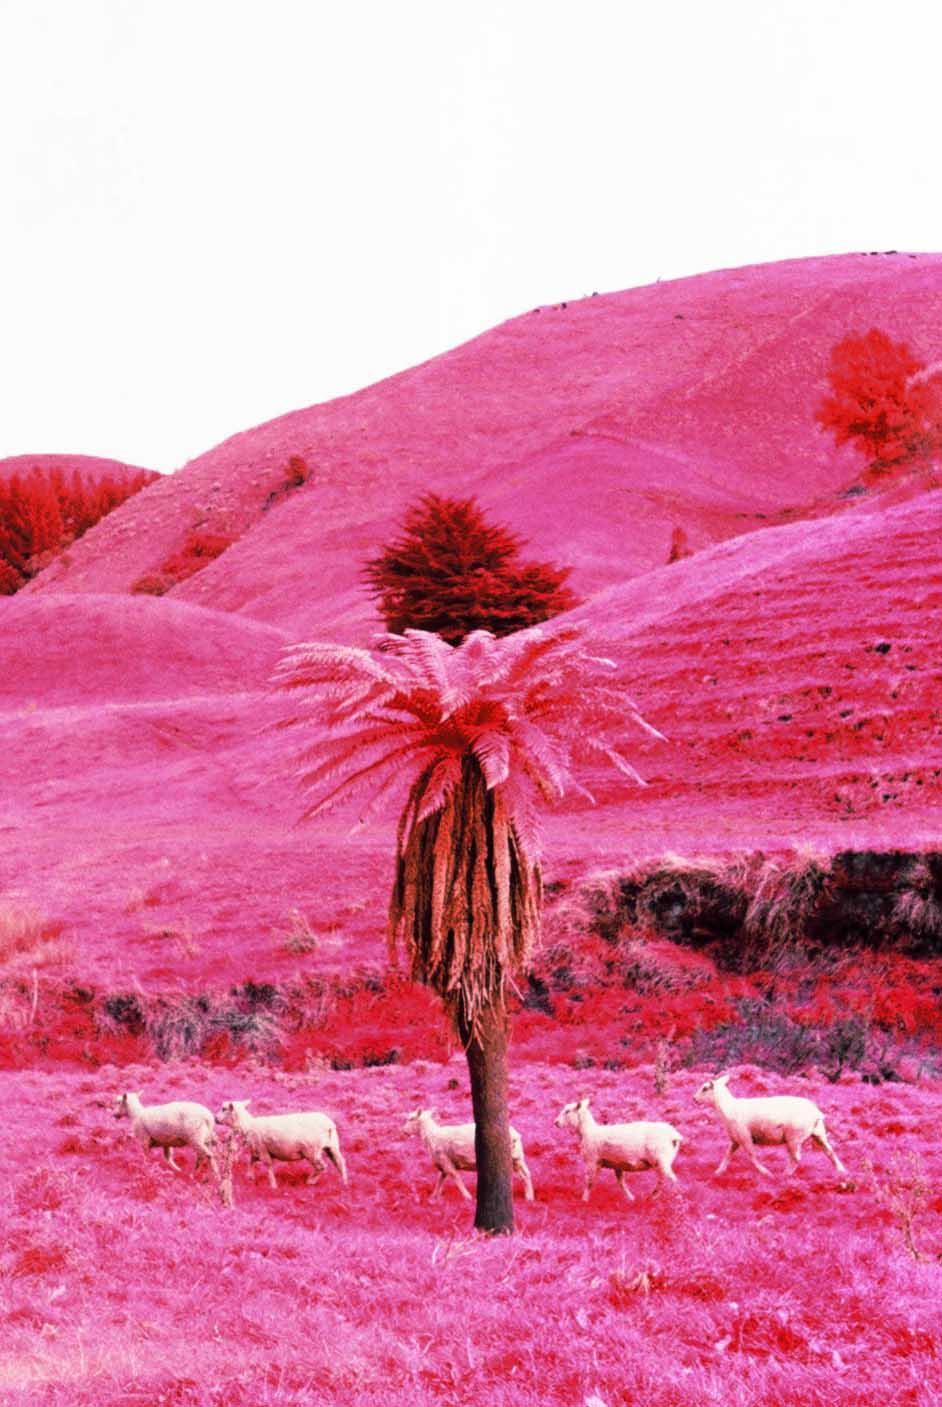 Infrared-New-Zealand-Kasia-Sykus-9.jpg